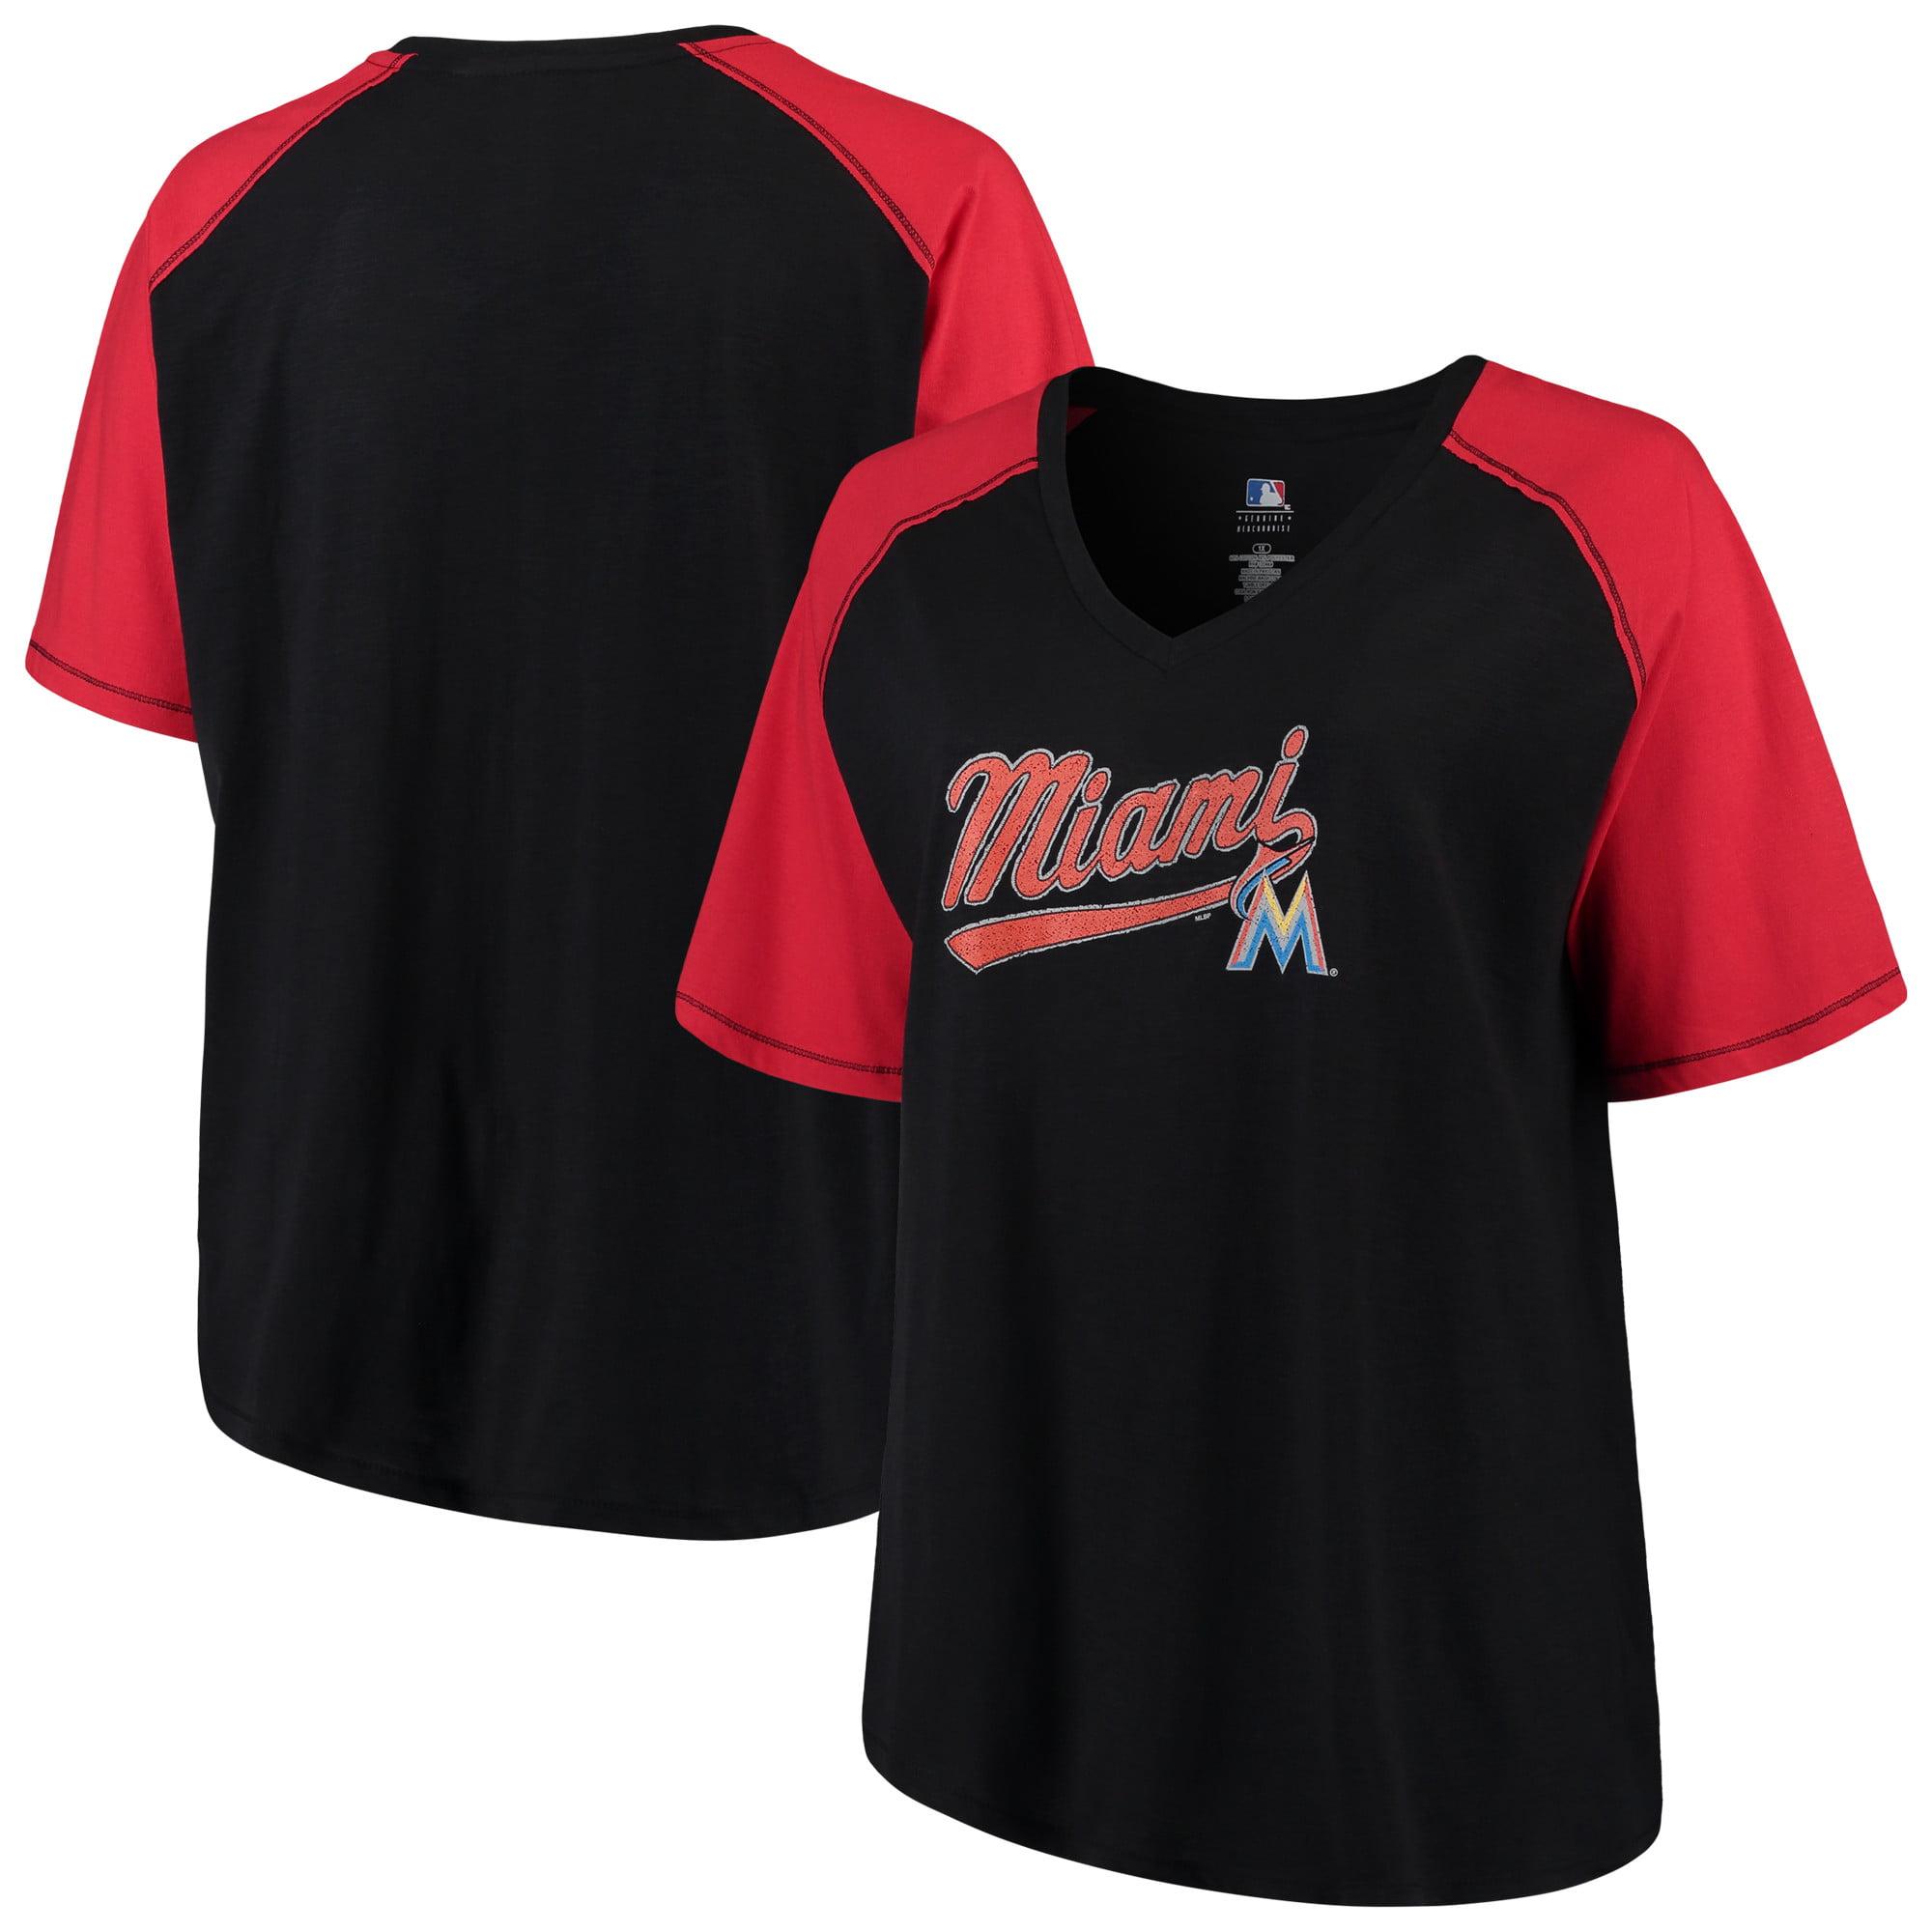 Women's Majestic Black/Red Miami Marlins Plus Size High Percentage Raglan V-Neck T-Shirt